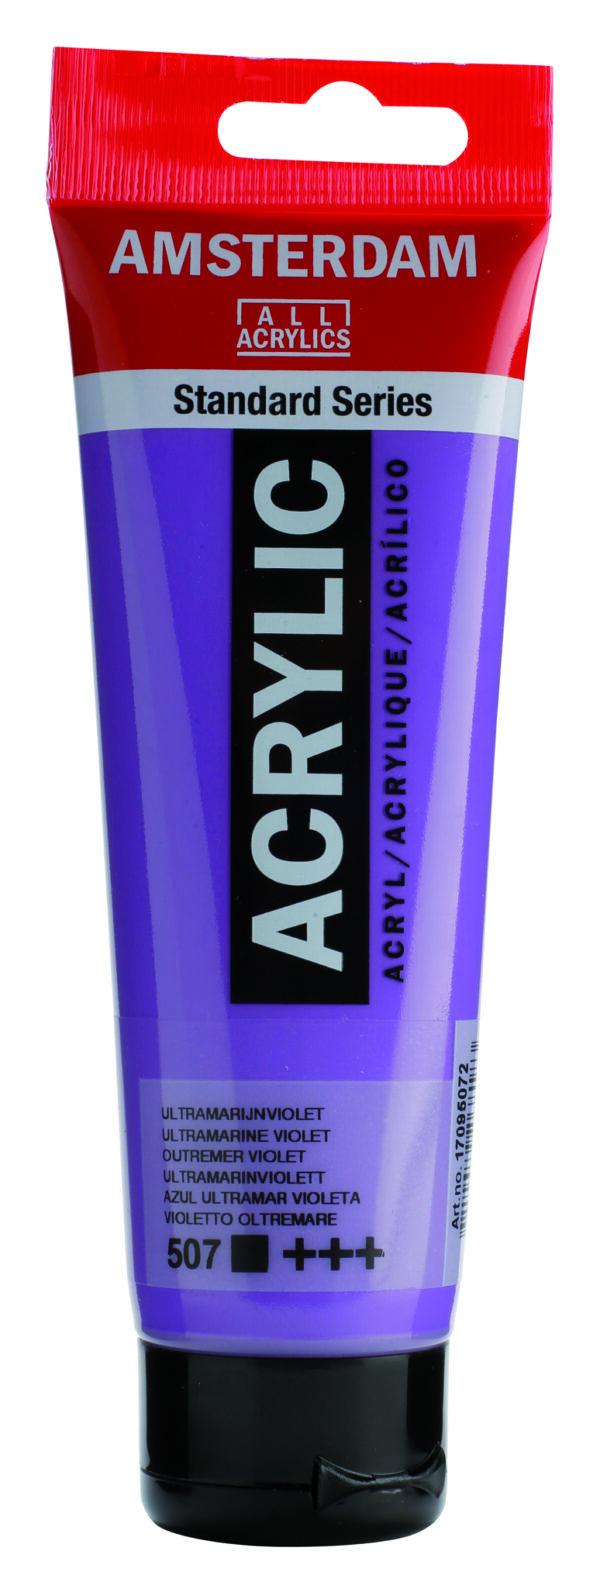 Ams std 507 Ultramarine violet - 120 ml